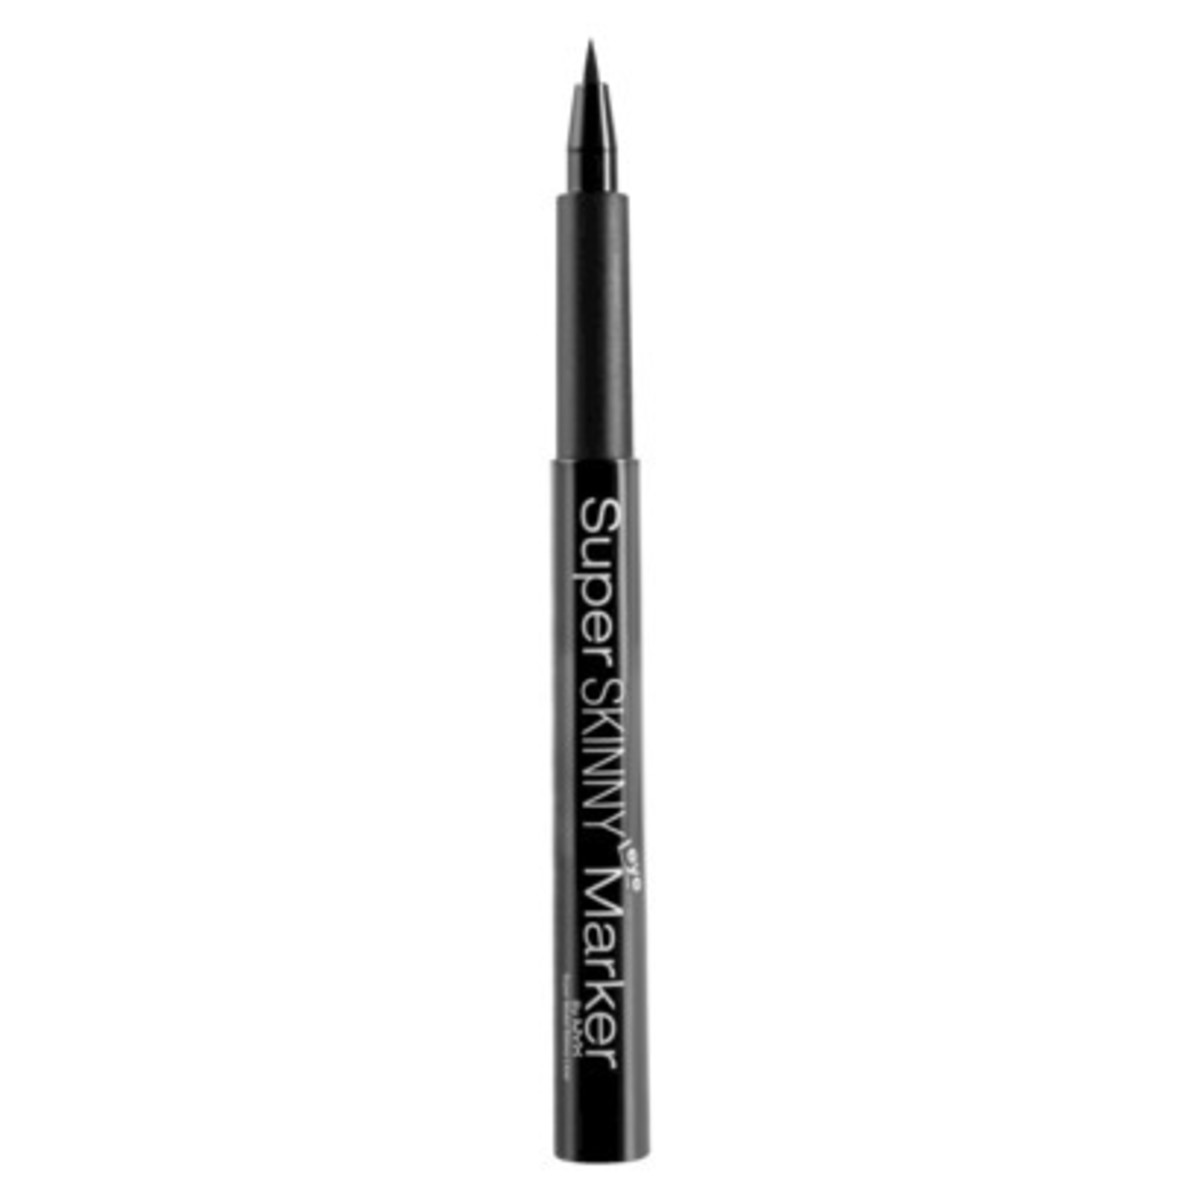 NYX Cosmetics Super Skinny Eye Marker in Carbon Black